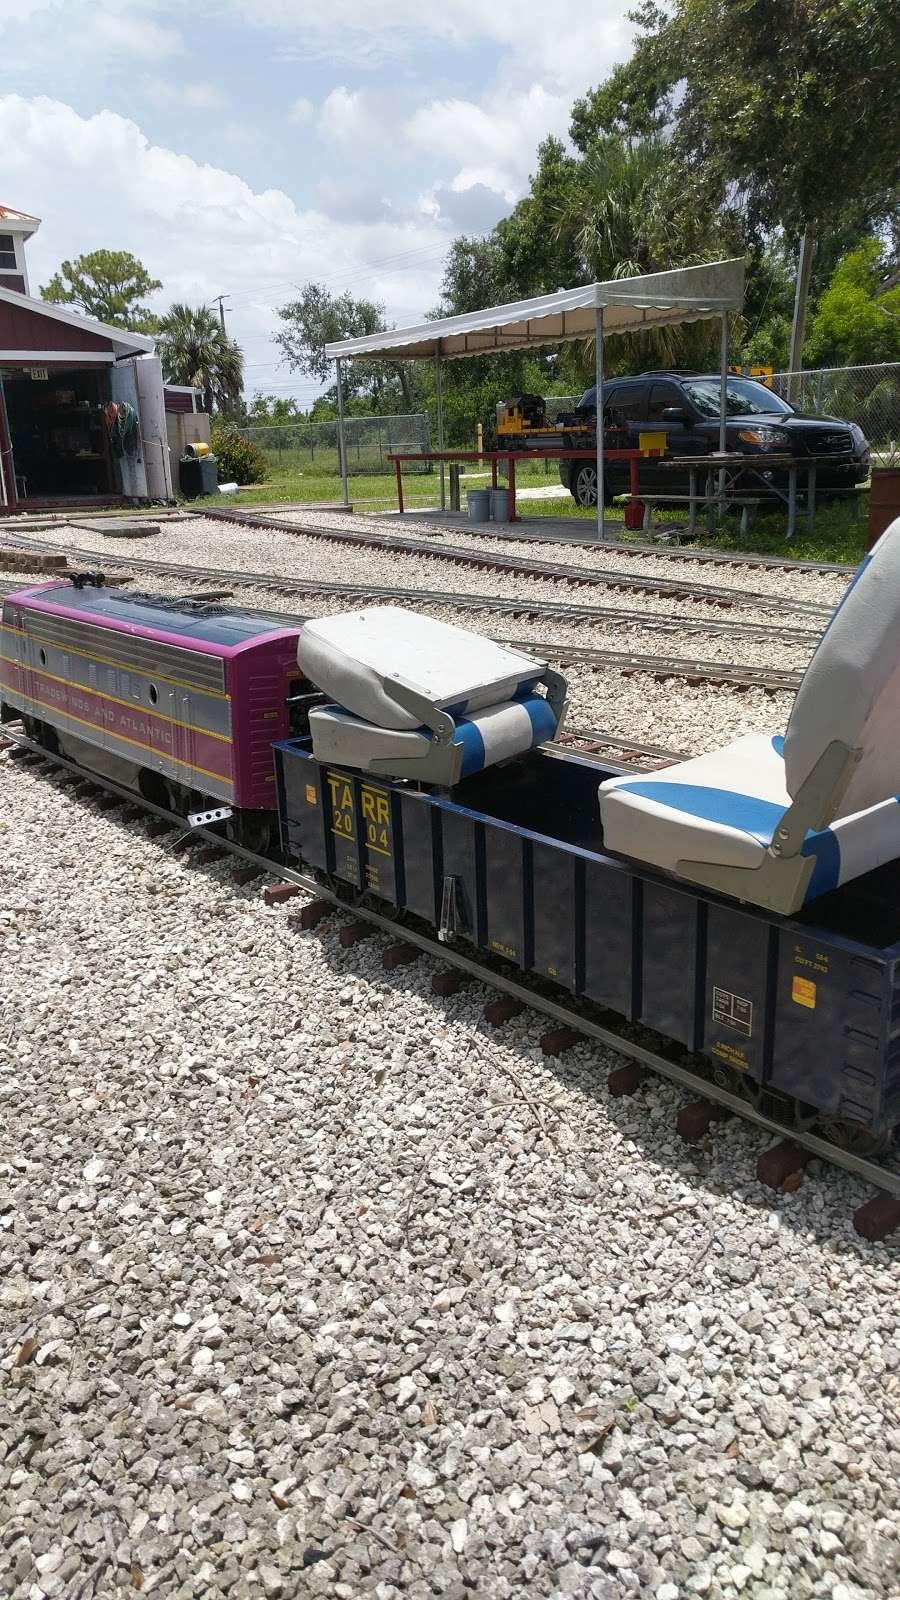 Tradewinds & Atlantic Railroad - museum  | Photo 3 of 10 | Address: Coconut Creek, FL 33073, USA | Phone: (954) 494-6877